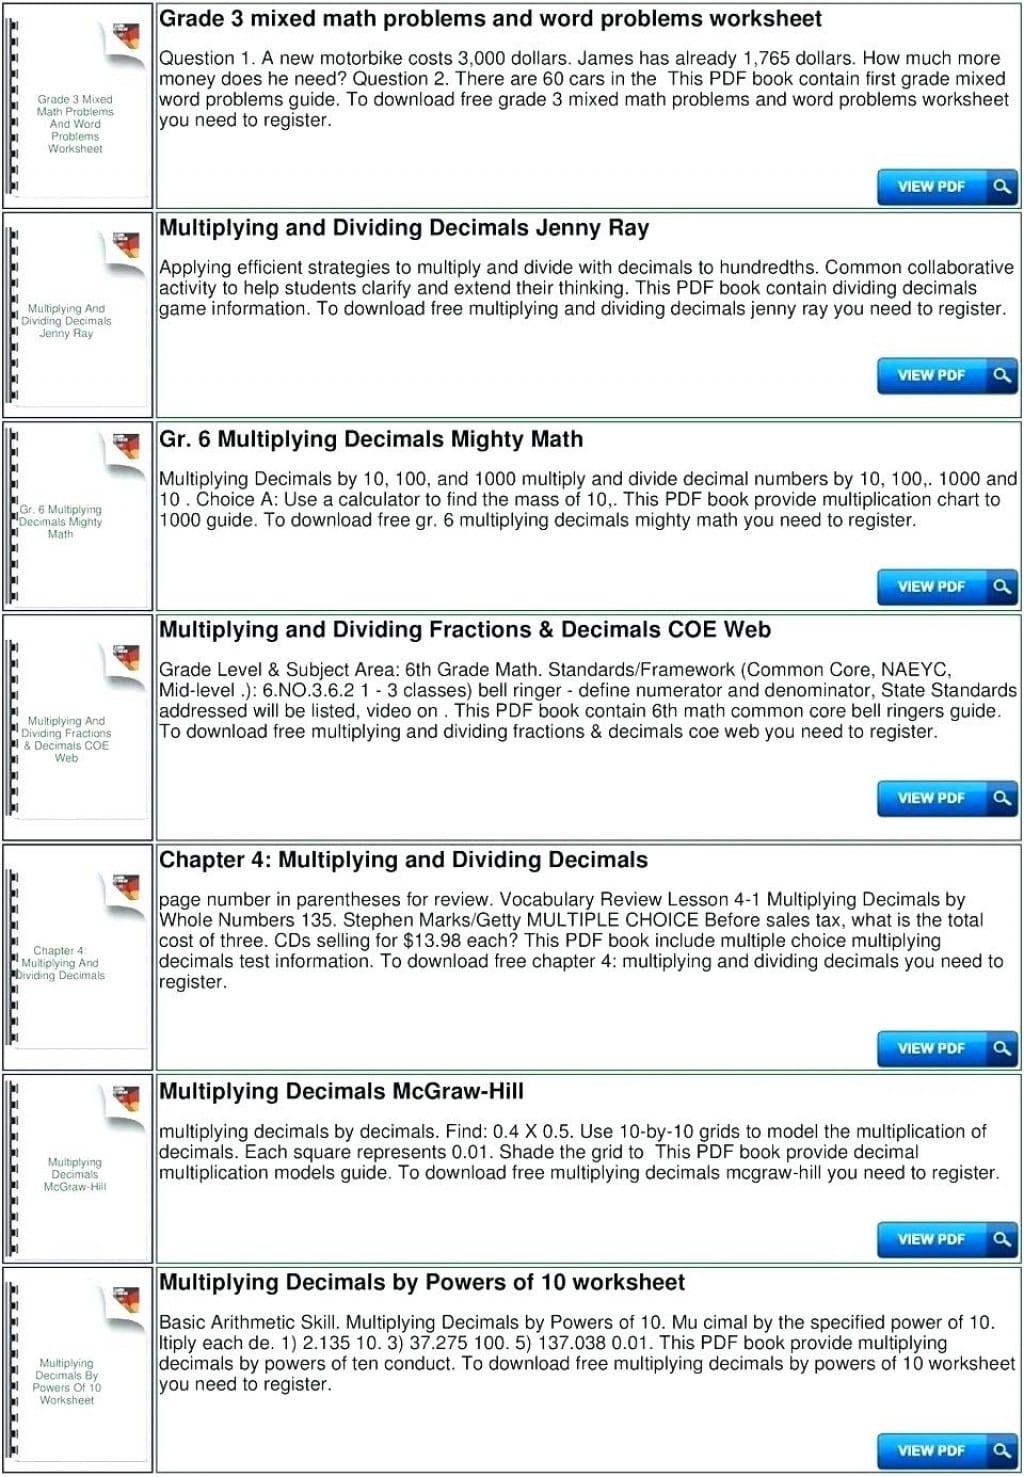 Singular Worksheet Multiplying Decimals10 100 And